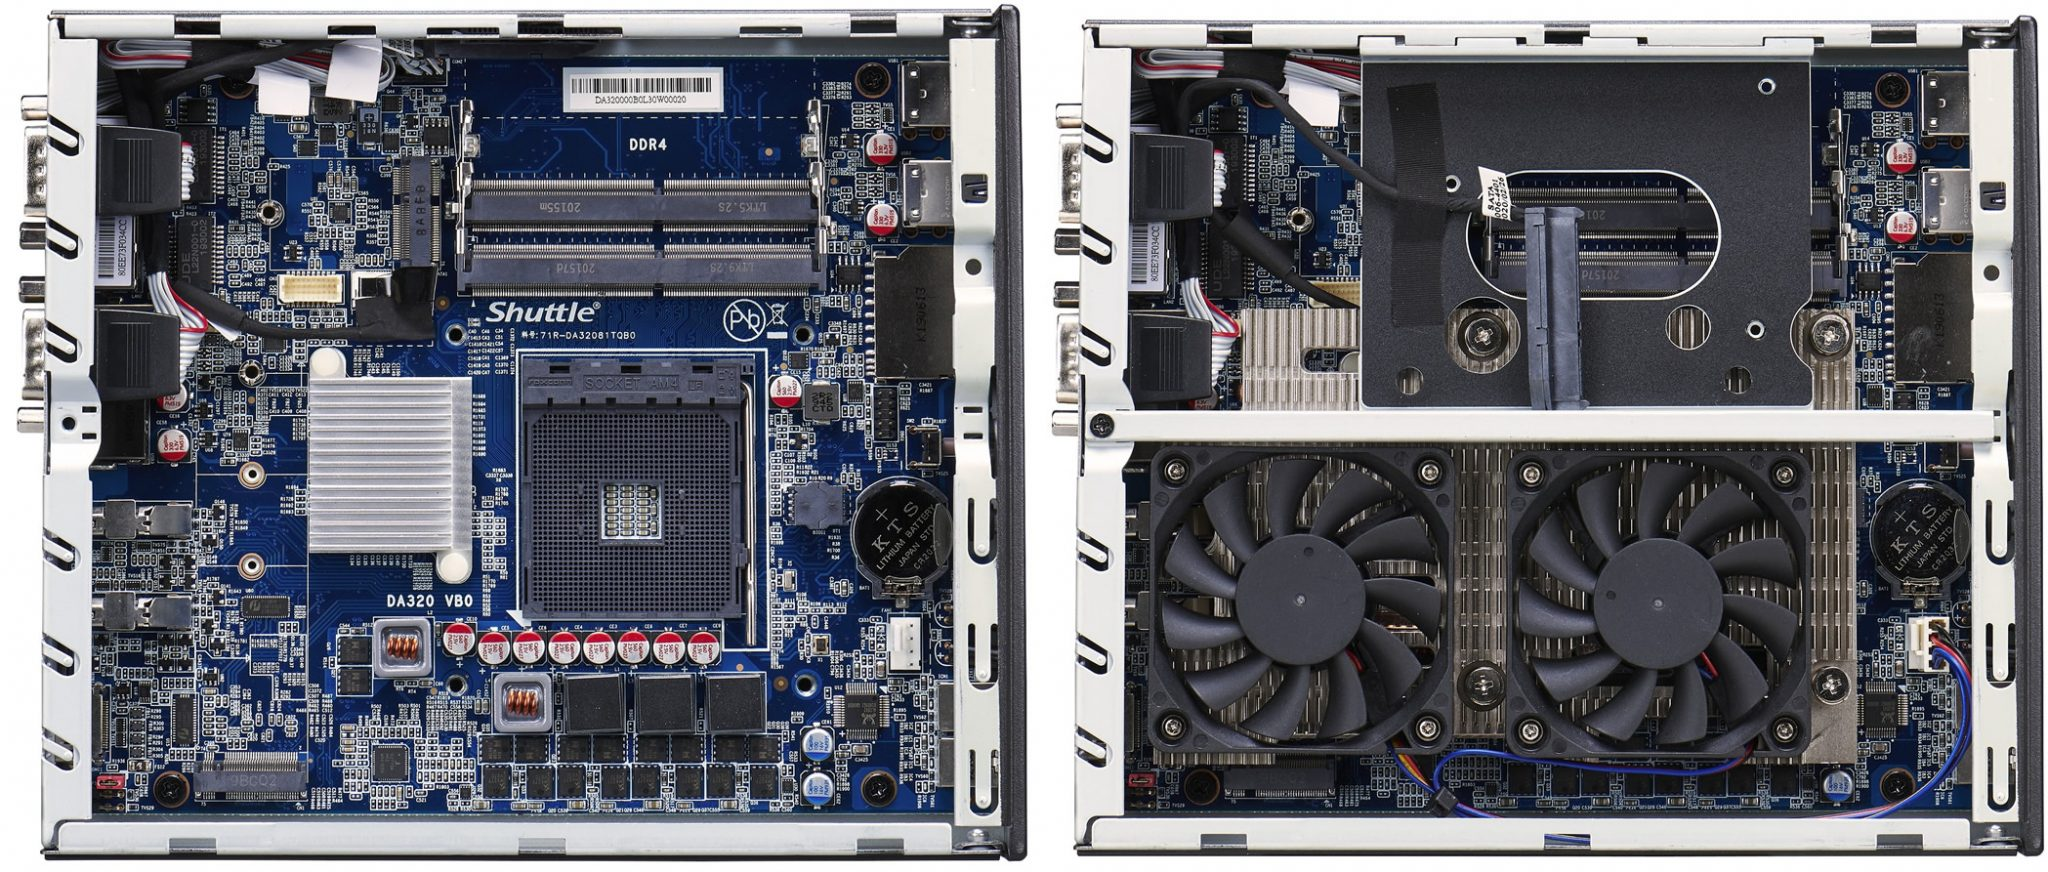 Shuttle XPC DA320 Sistema de refrigeracion 2048x872 1